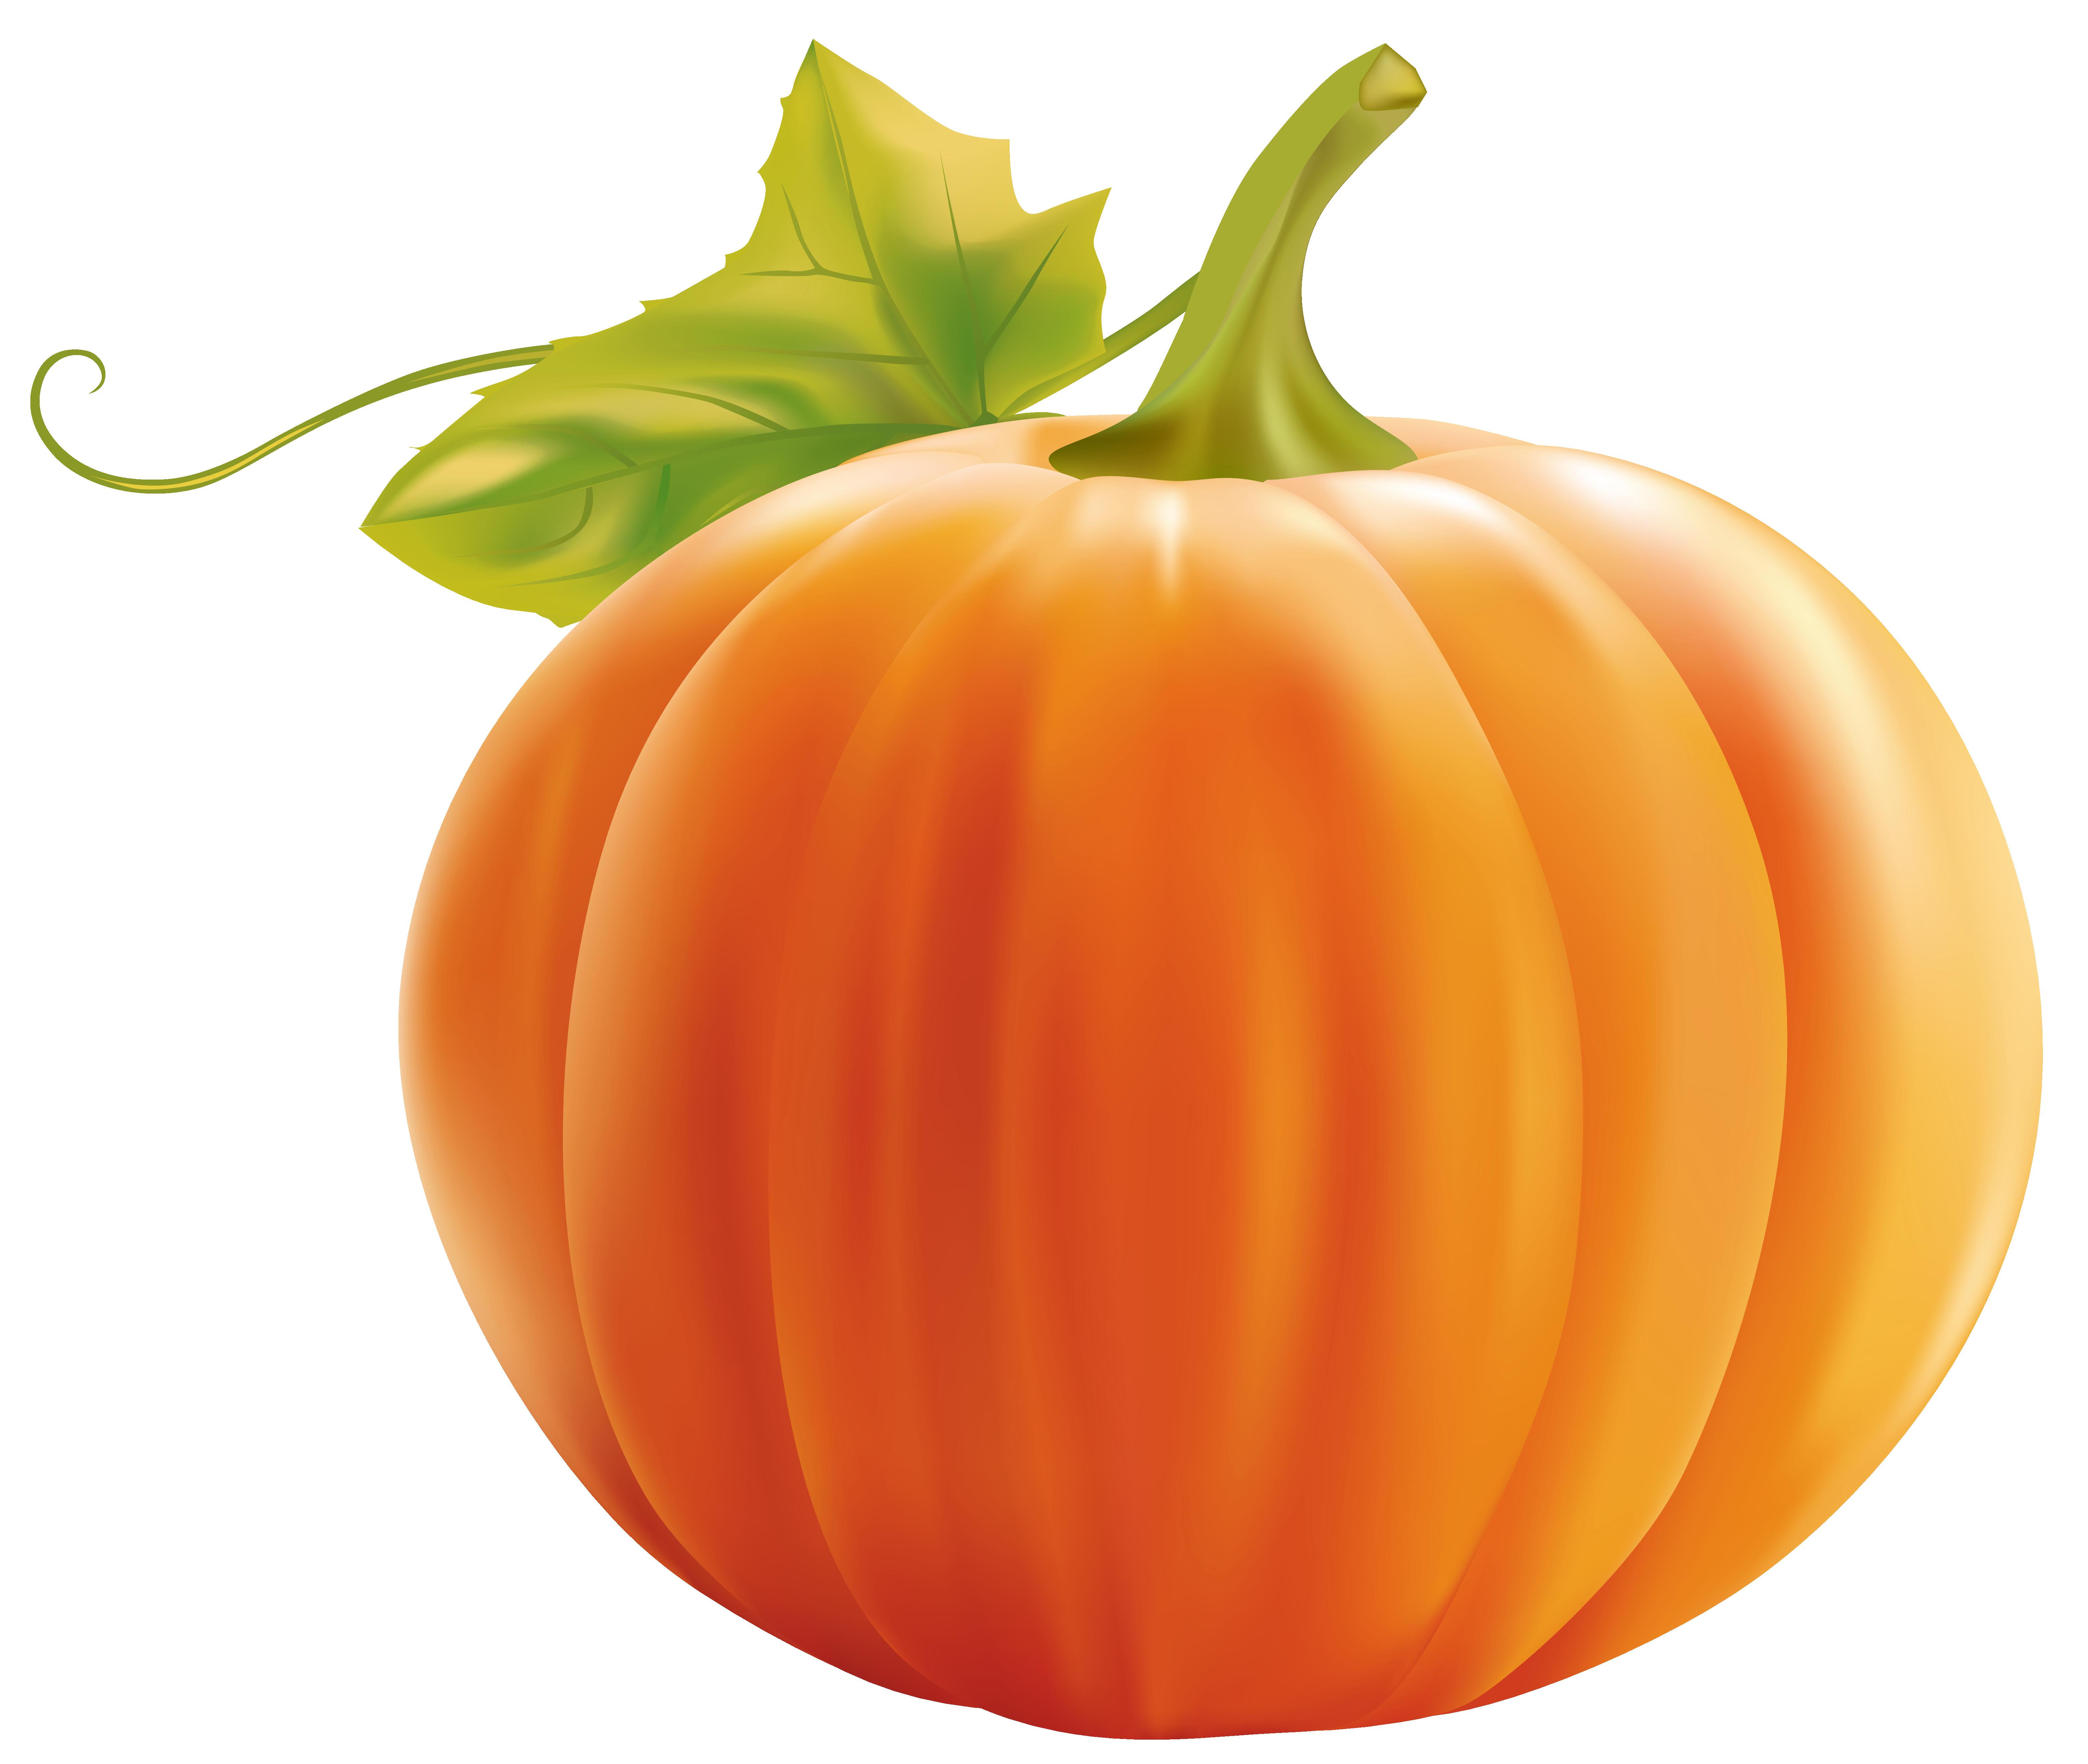 6258x5286 Pumpkin Clipart Image